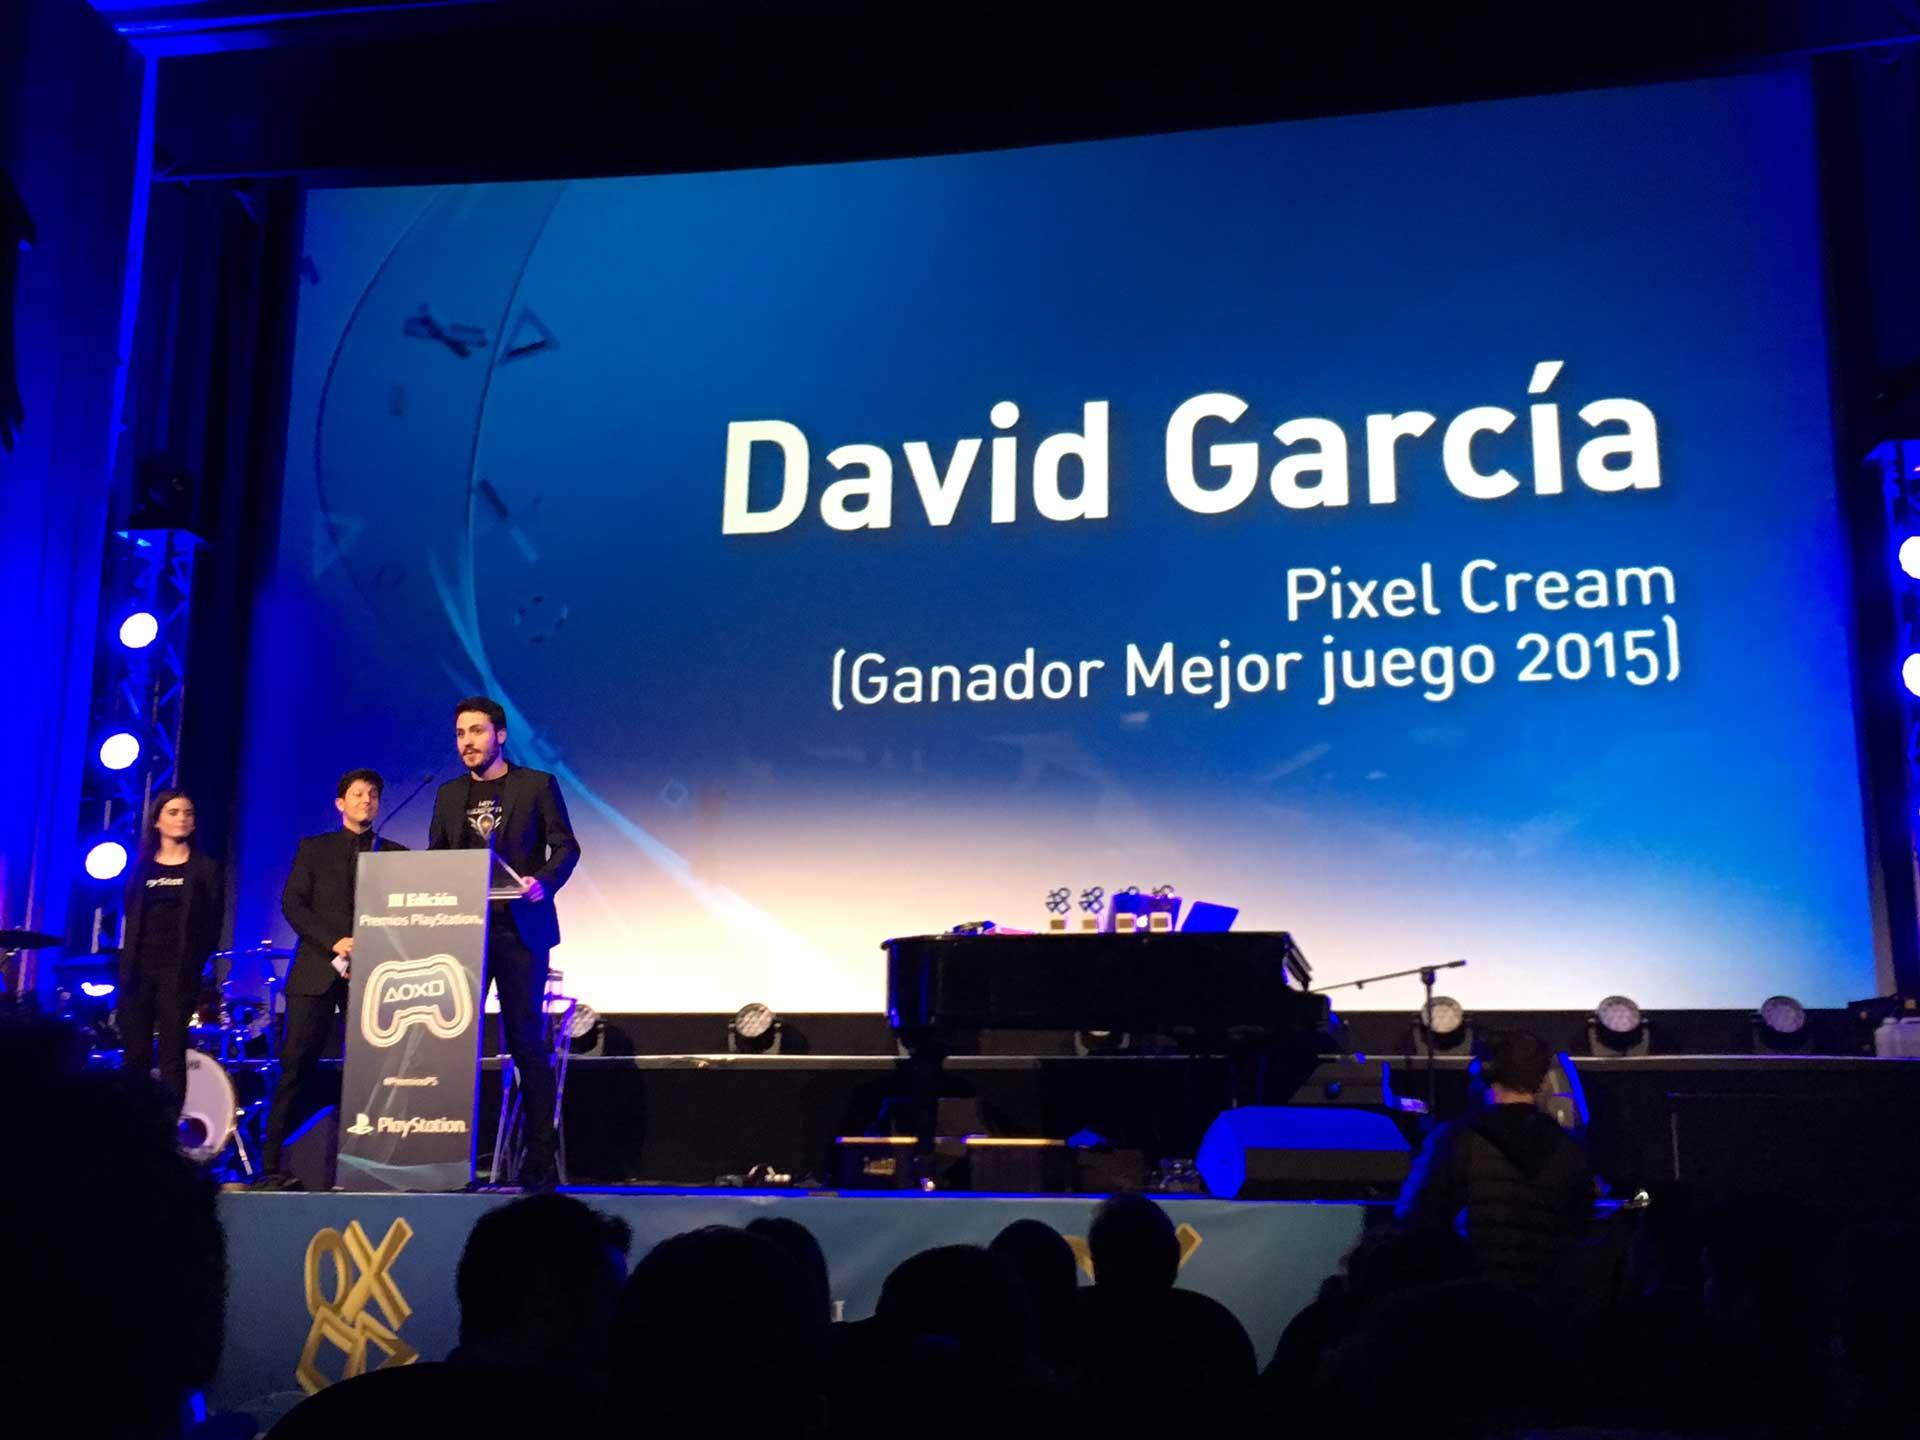 David García, de pixel cream